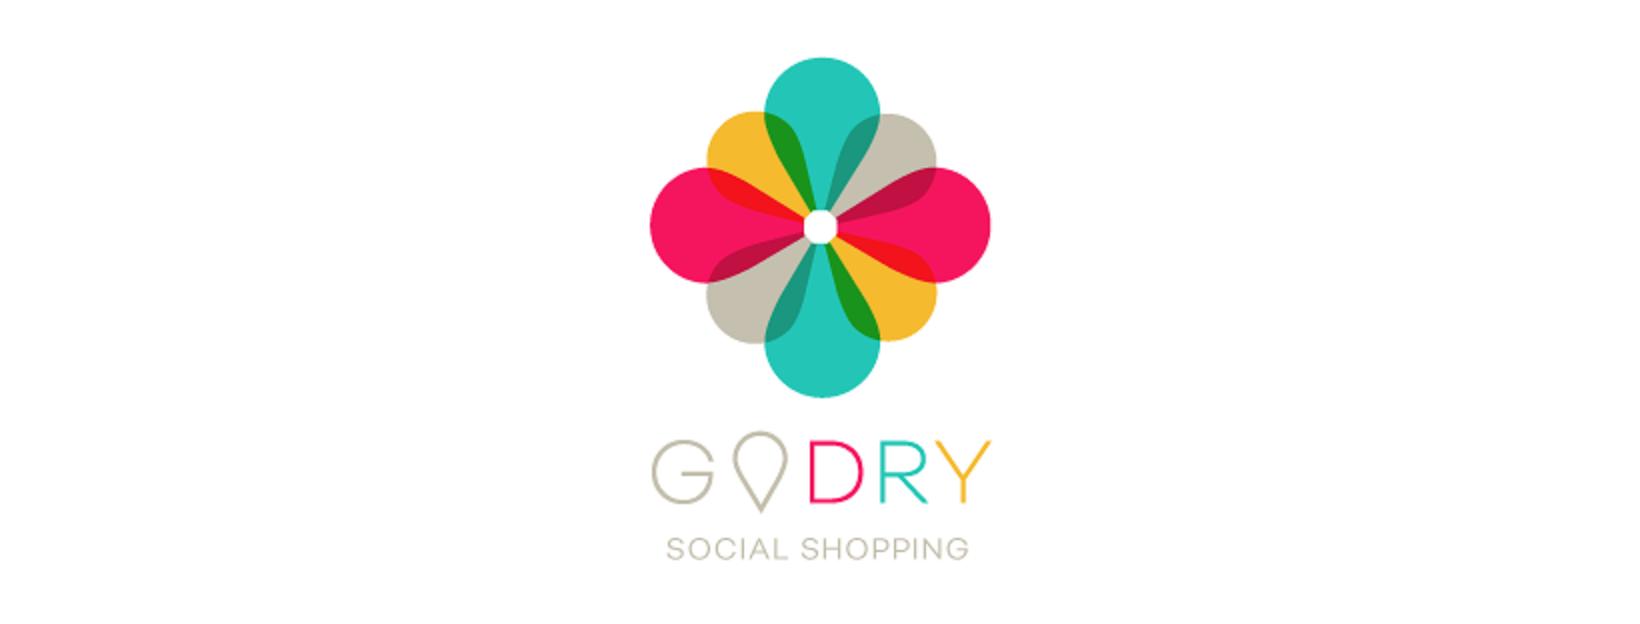 Godry Social Shopping Logo